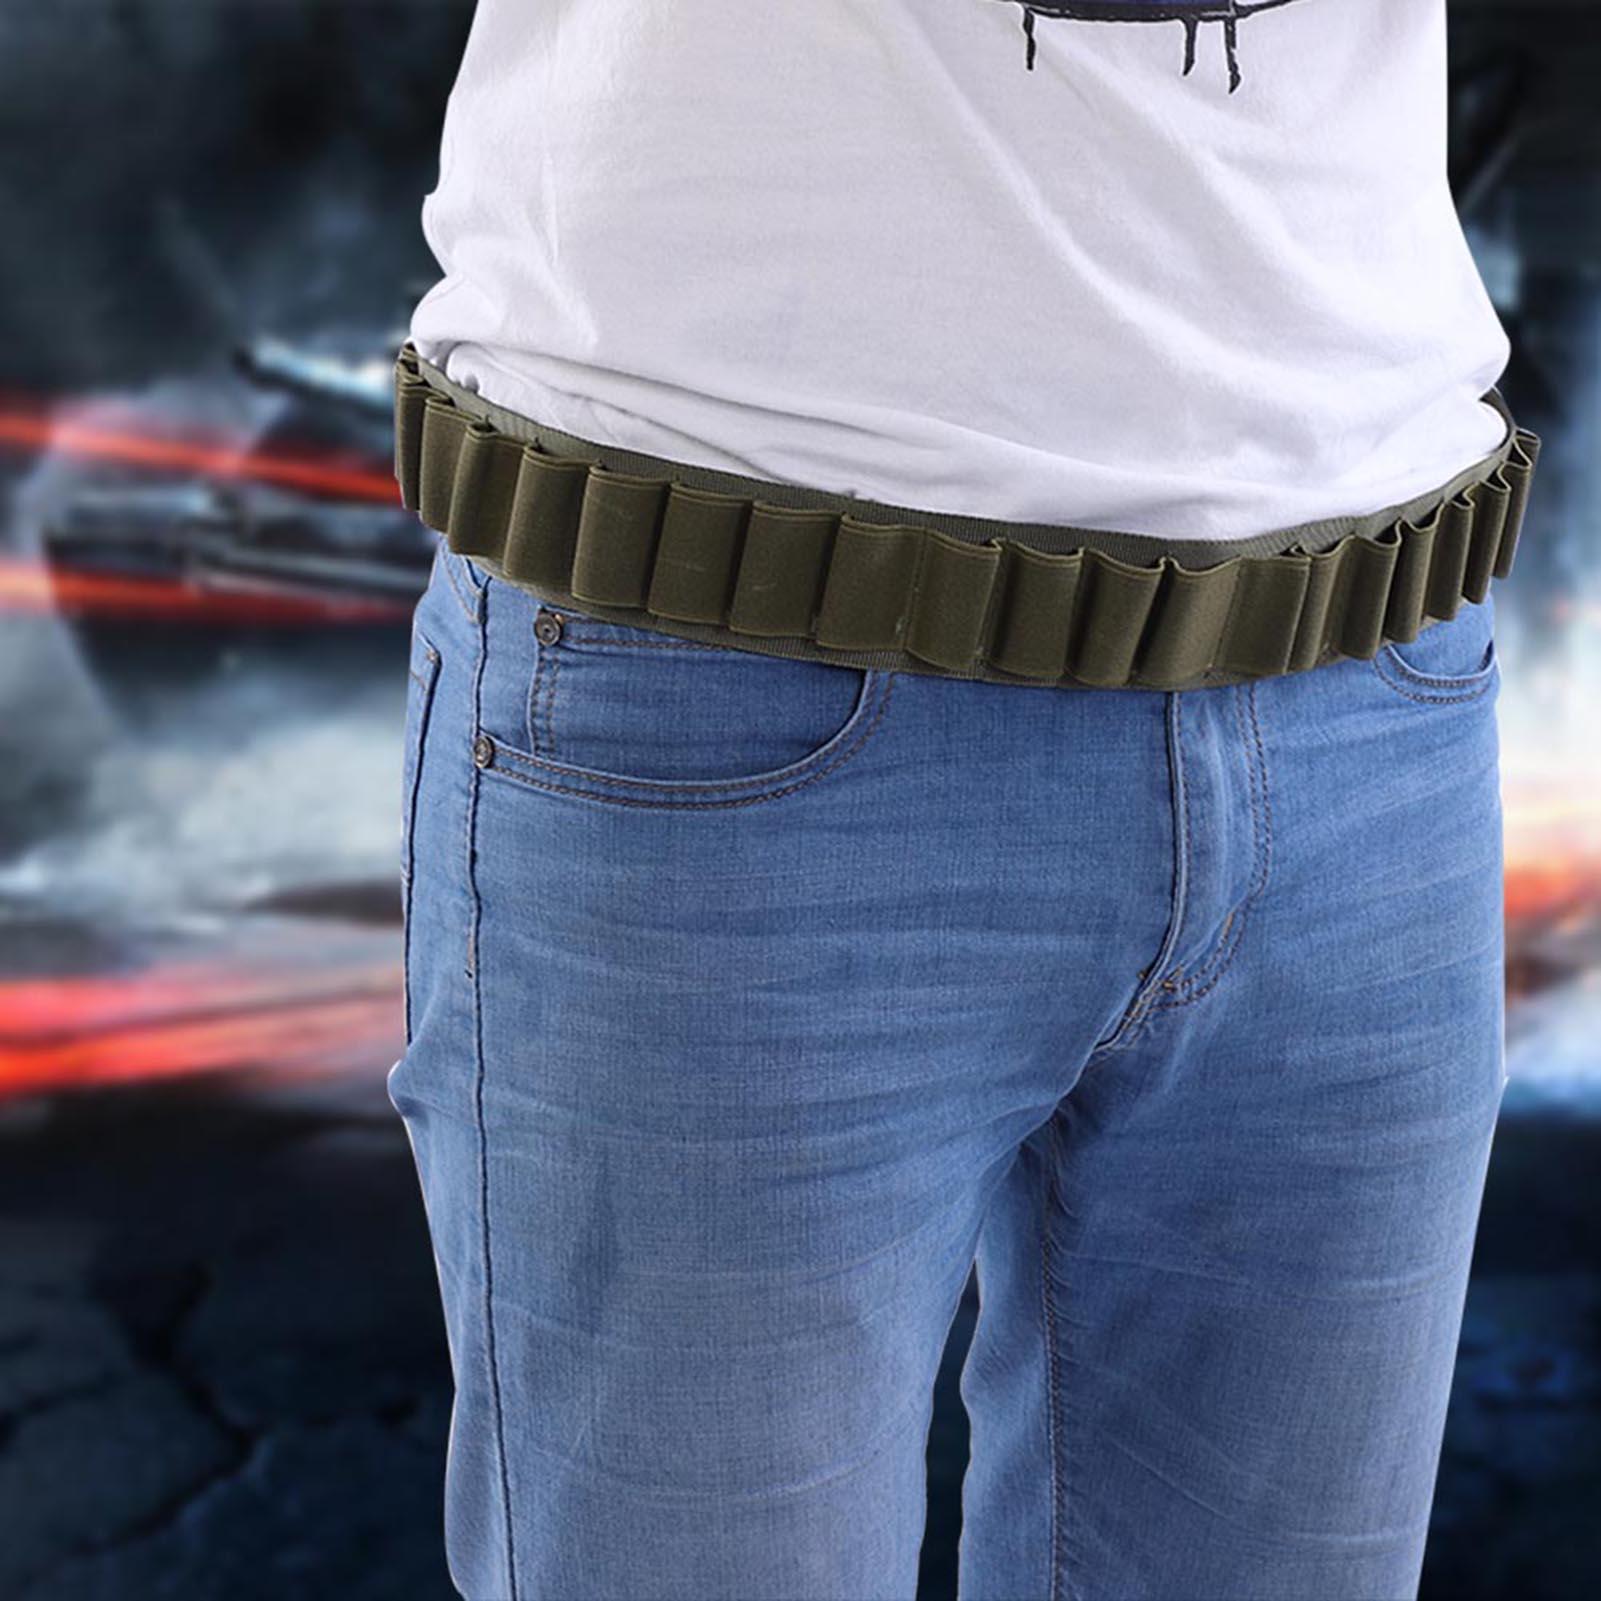 27 Round Shotshell 12GA Shotgun Shell Belt Airsoft Bandolier Bullet Ammo Holder